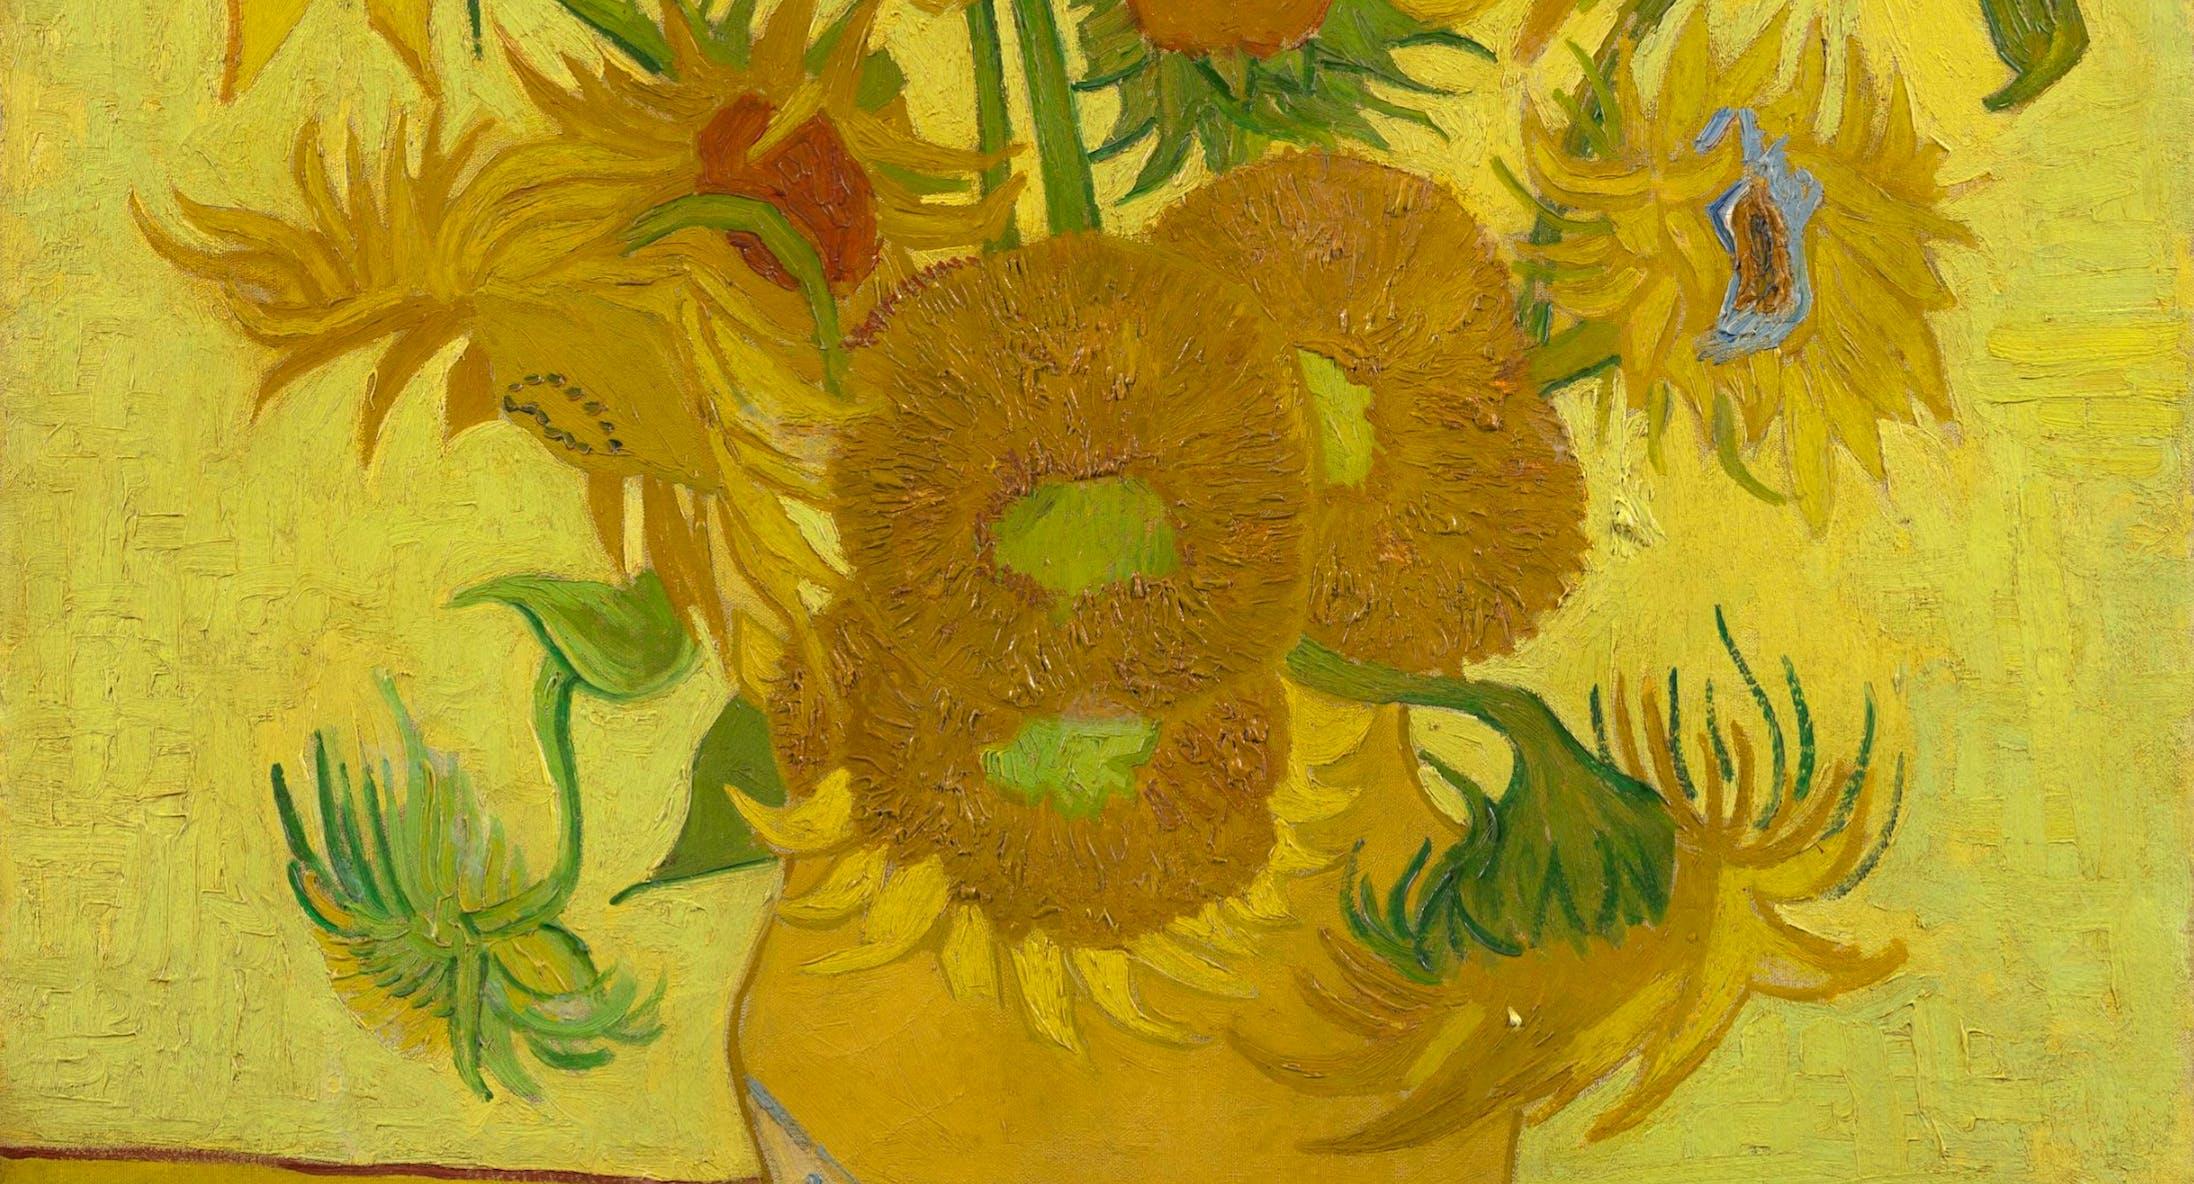 MN Art Stories | VINCENT · Friday Art Tour · Van Gogh Museum Amsterdam